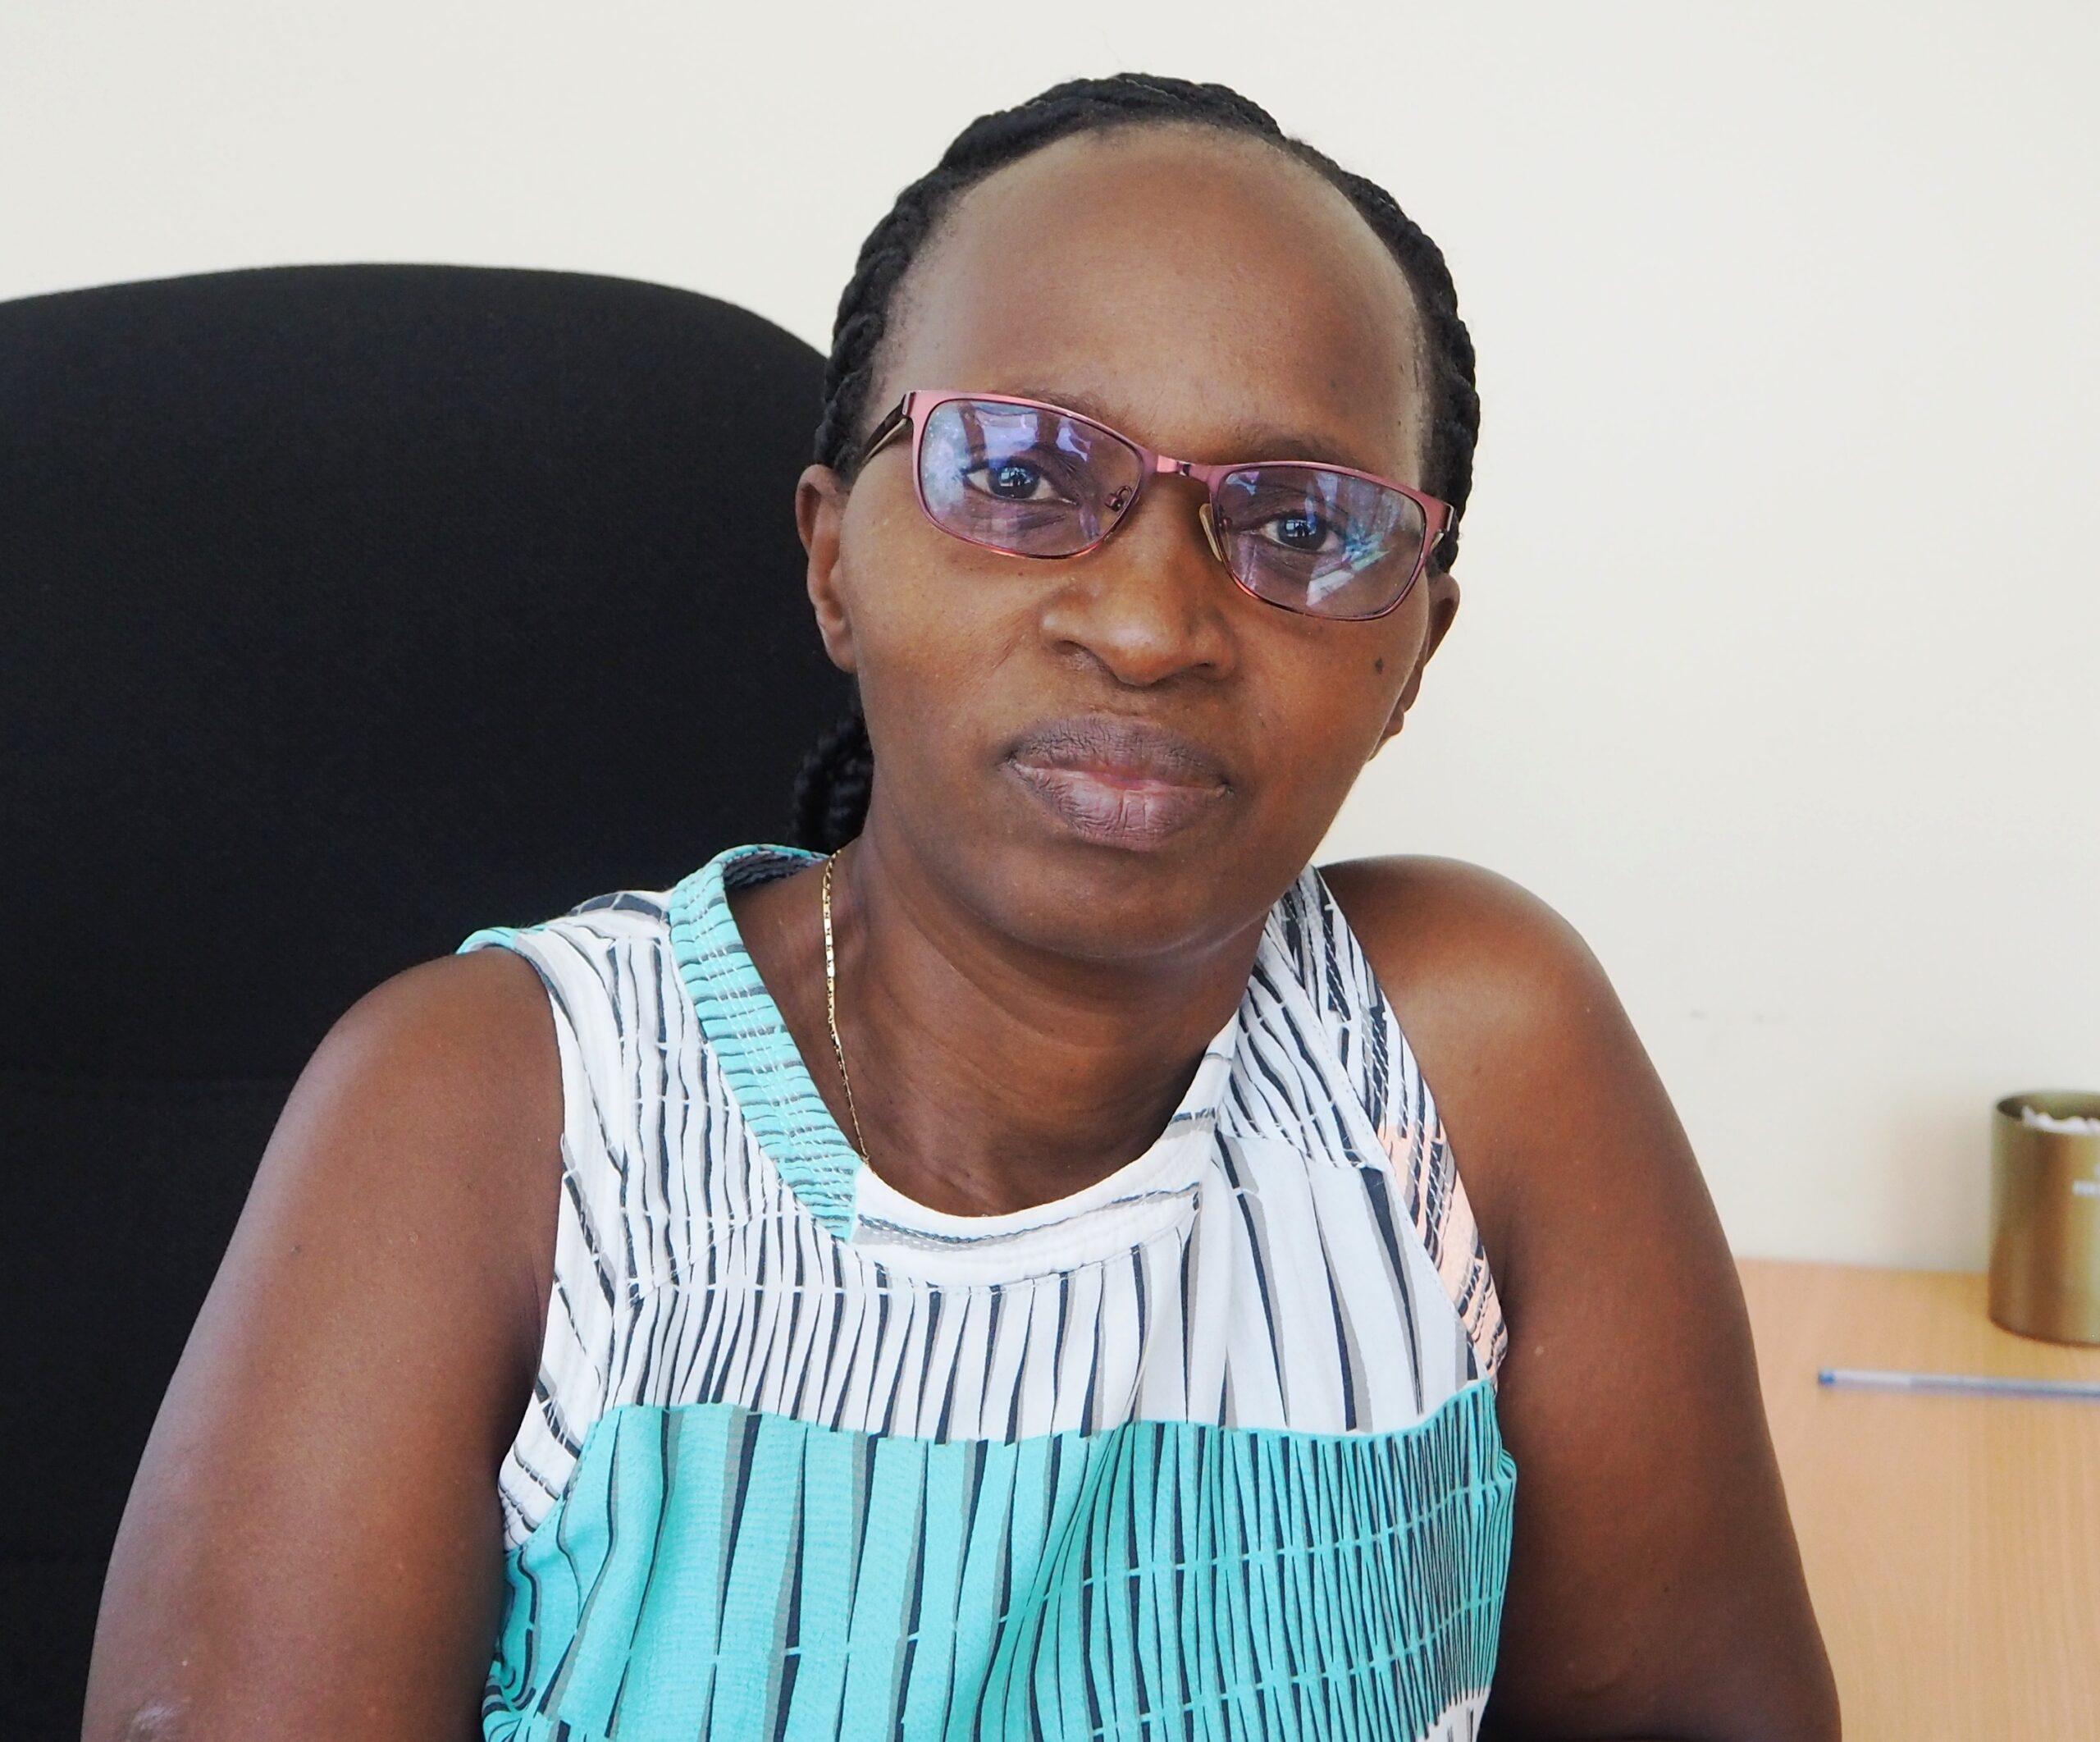 Violette Mfitumukiza